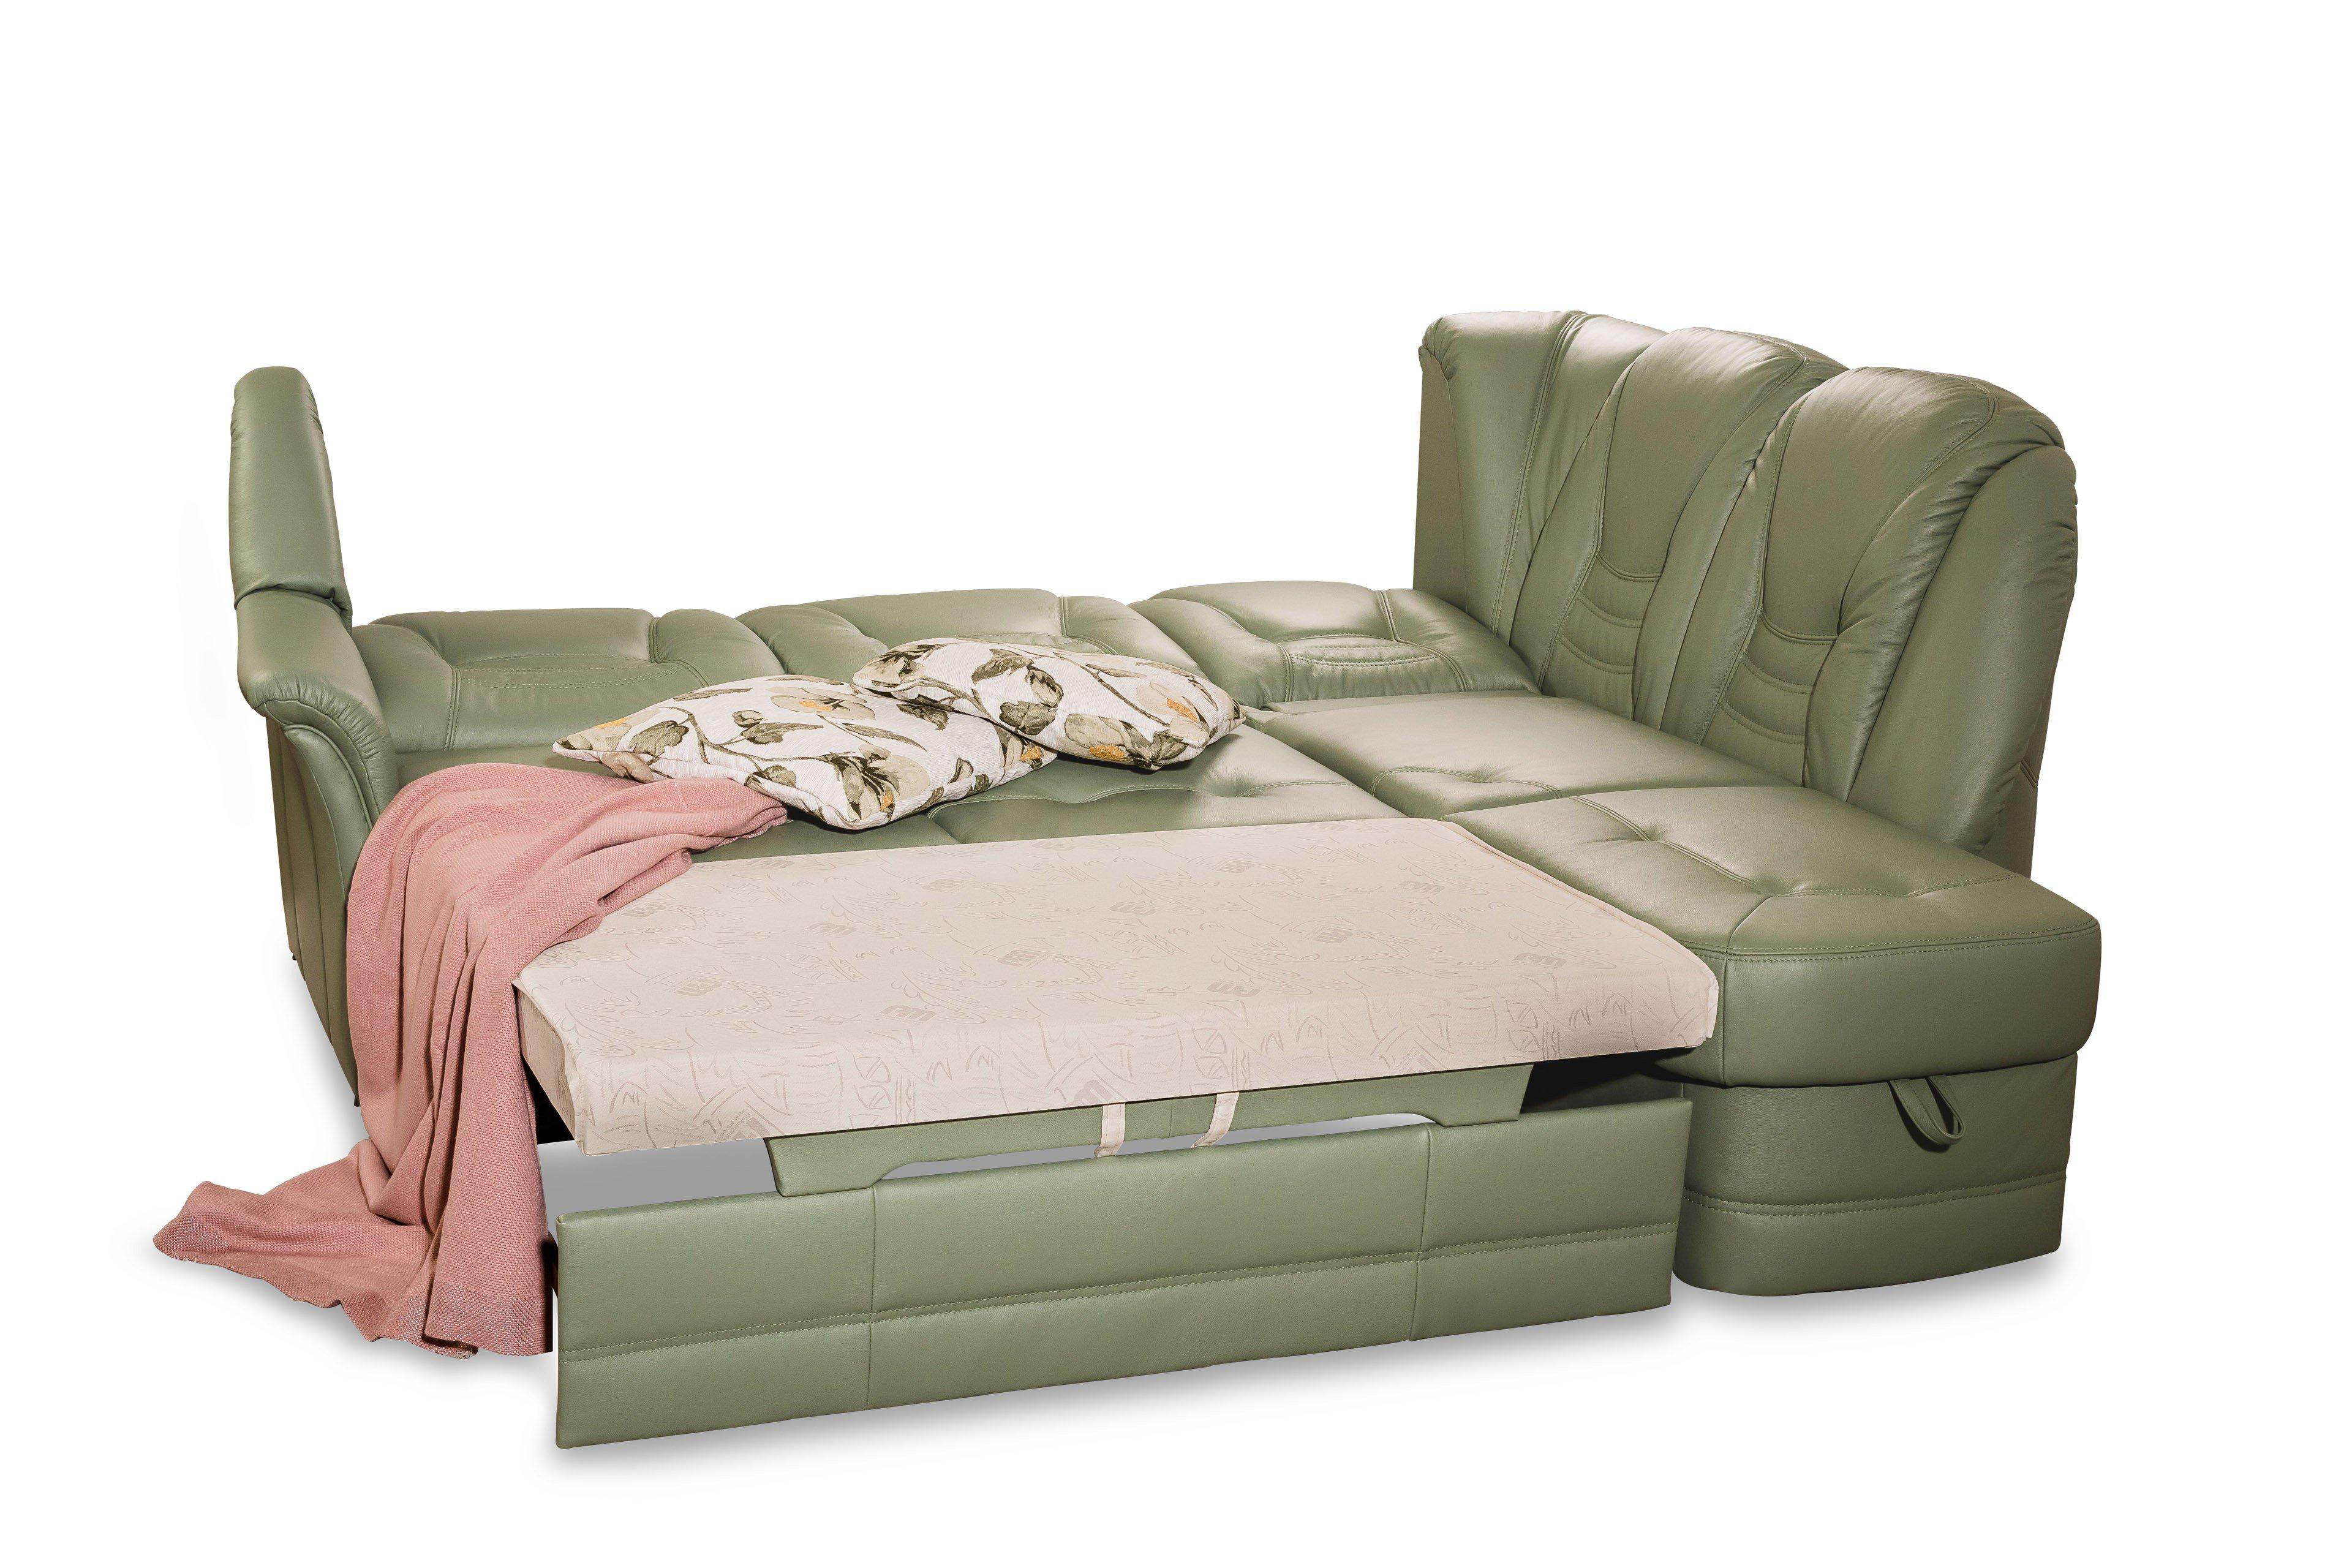 pm oelsa meissen ledersofa in gr n m bel letz ihr. Black Bedroom Furniture Sets. Home Design Ideas